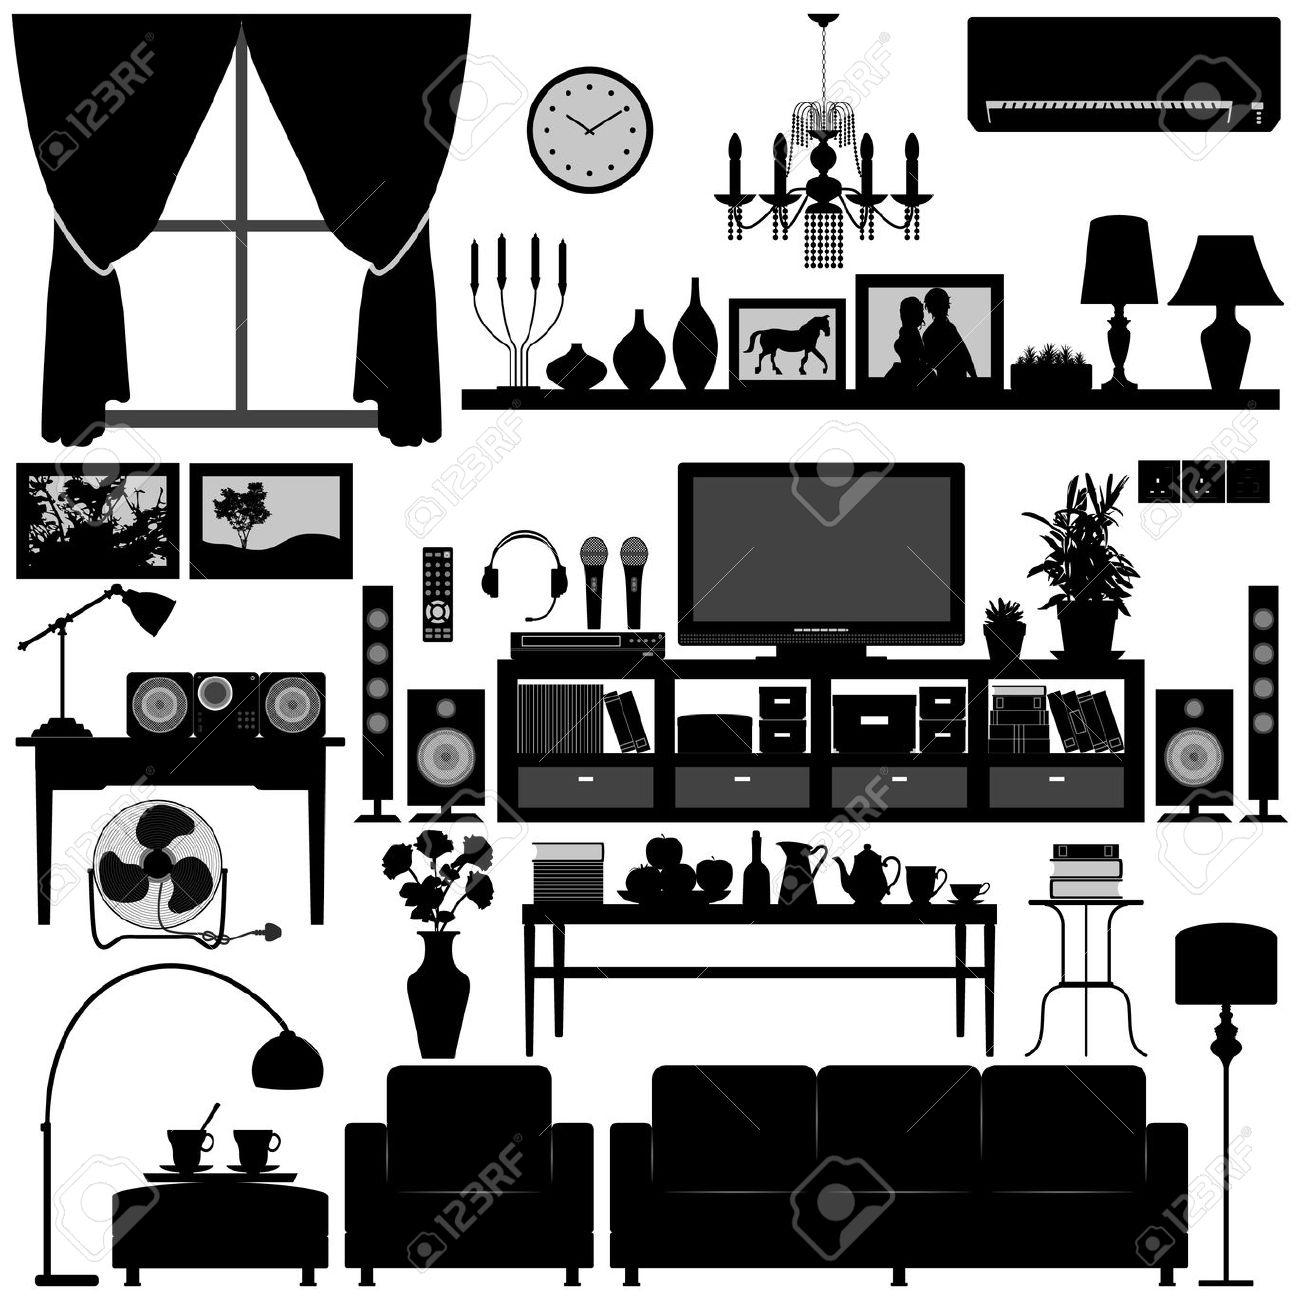 Home interior clipart design.